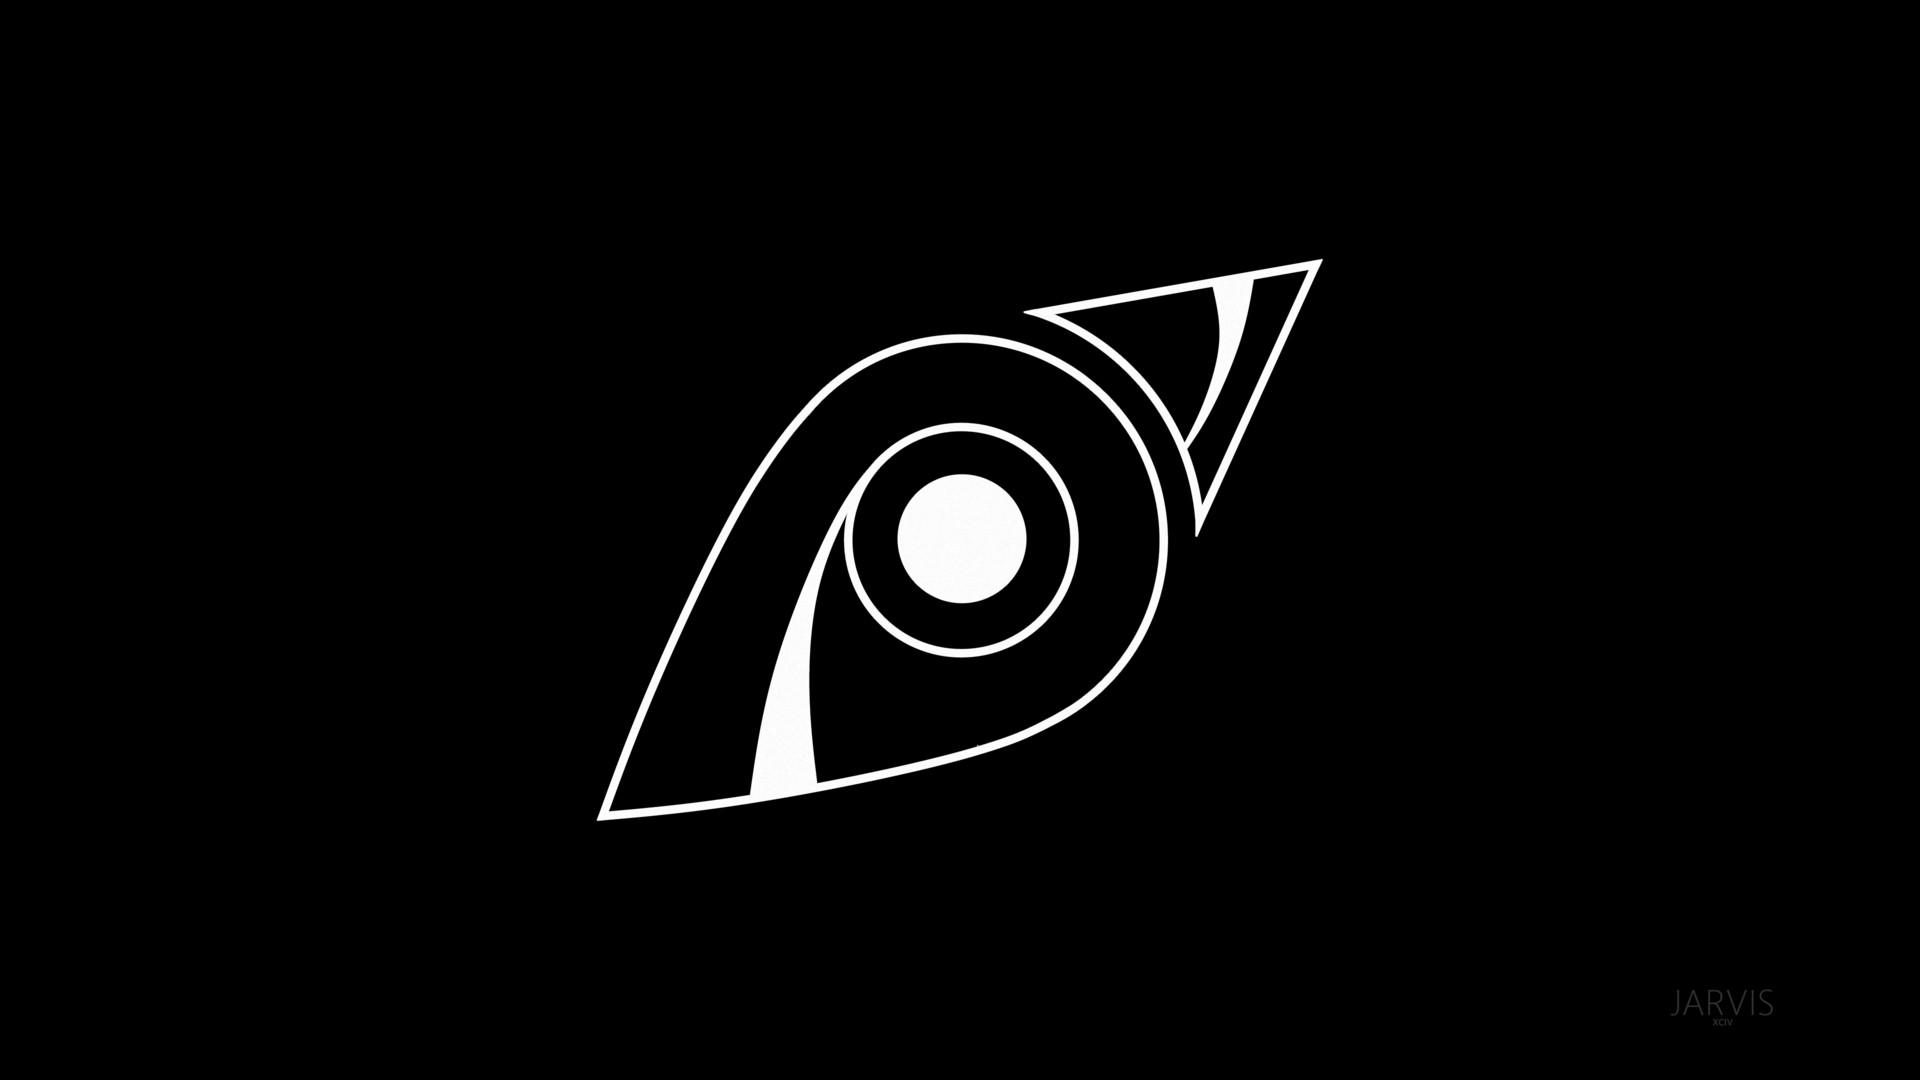 Artstation Rainbow Six Siege Logo Wallpaper Pack Jarvis Xciv